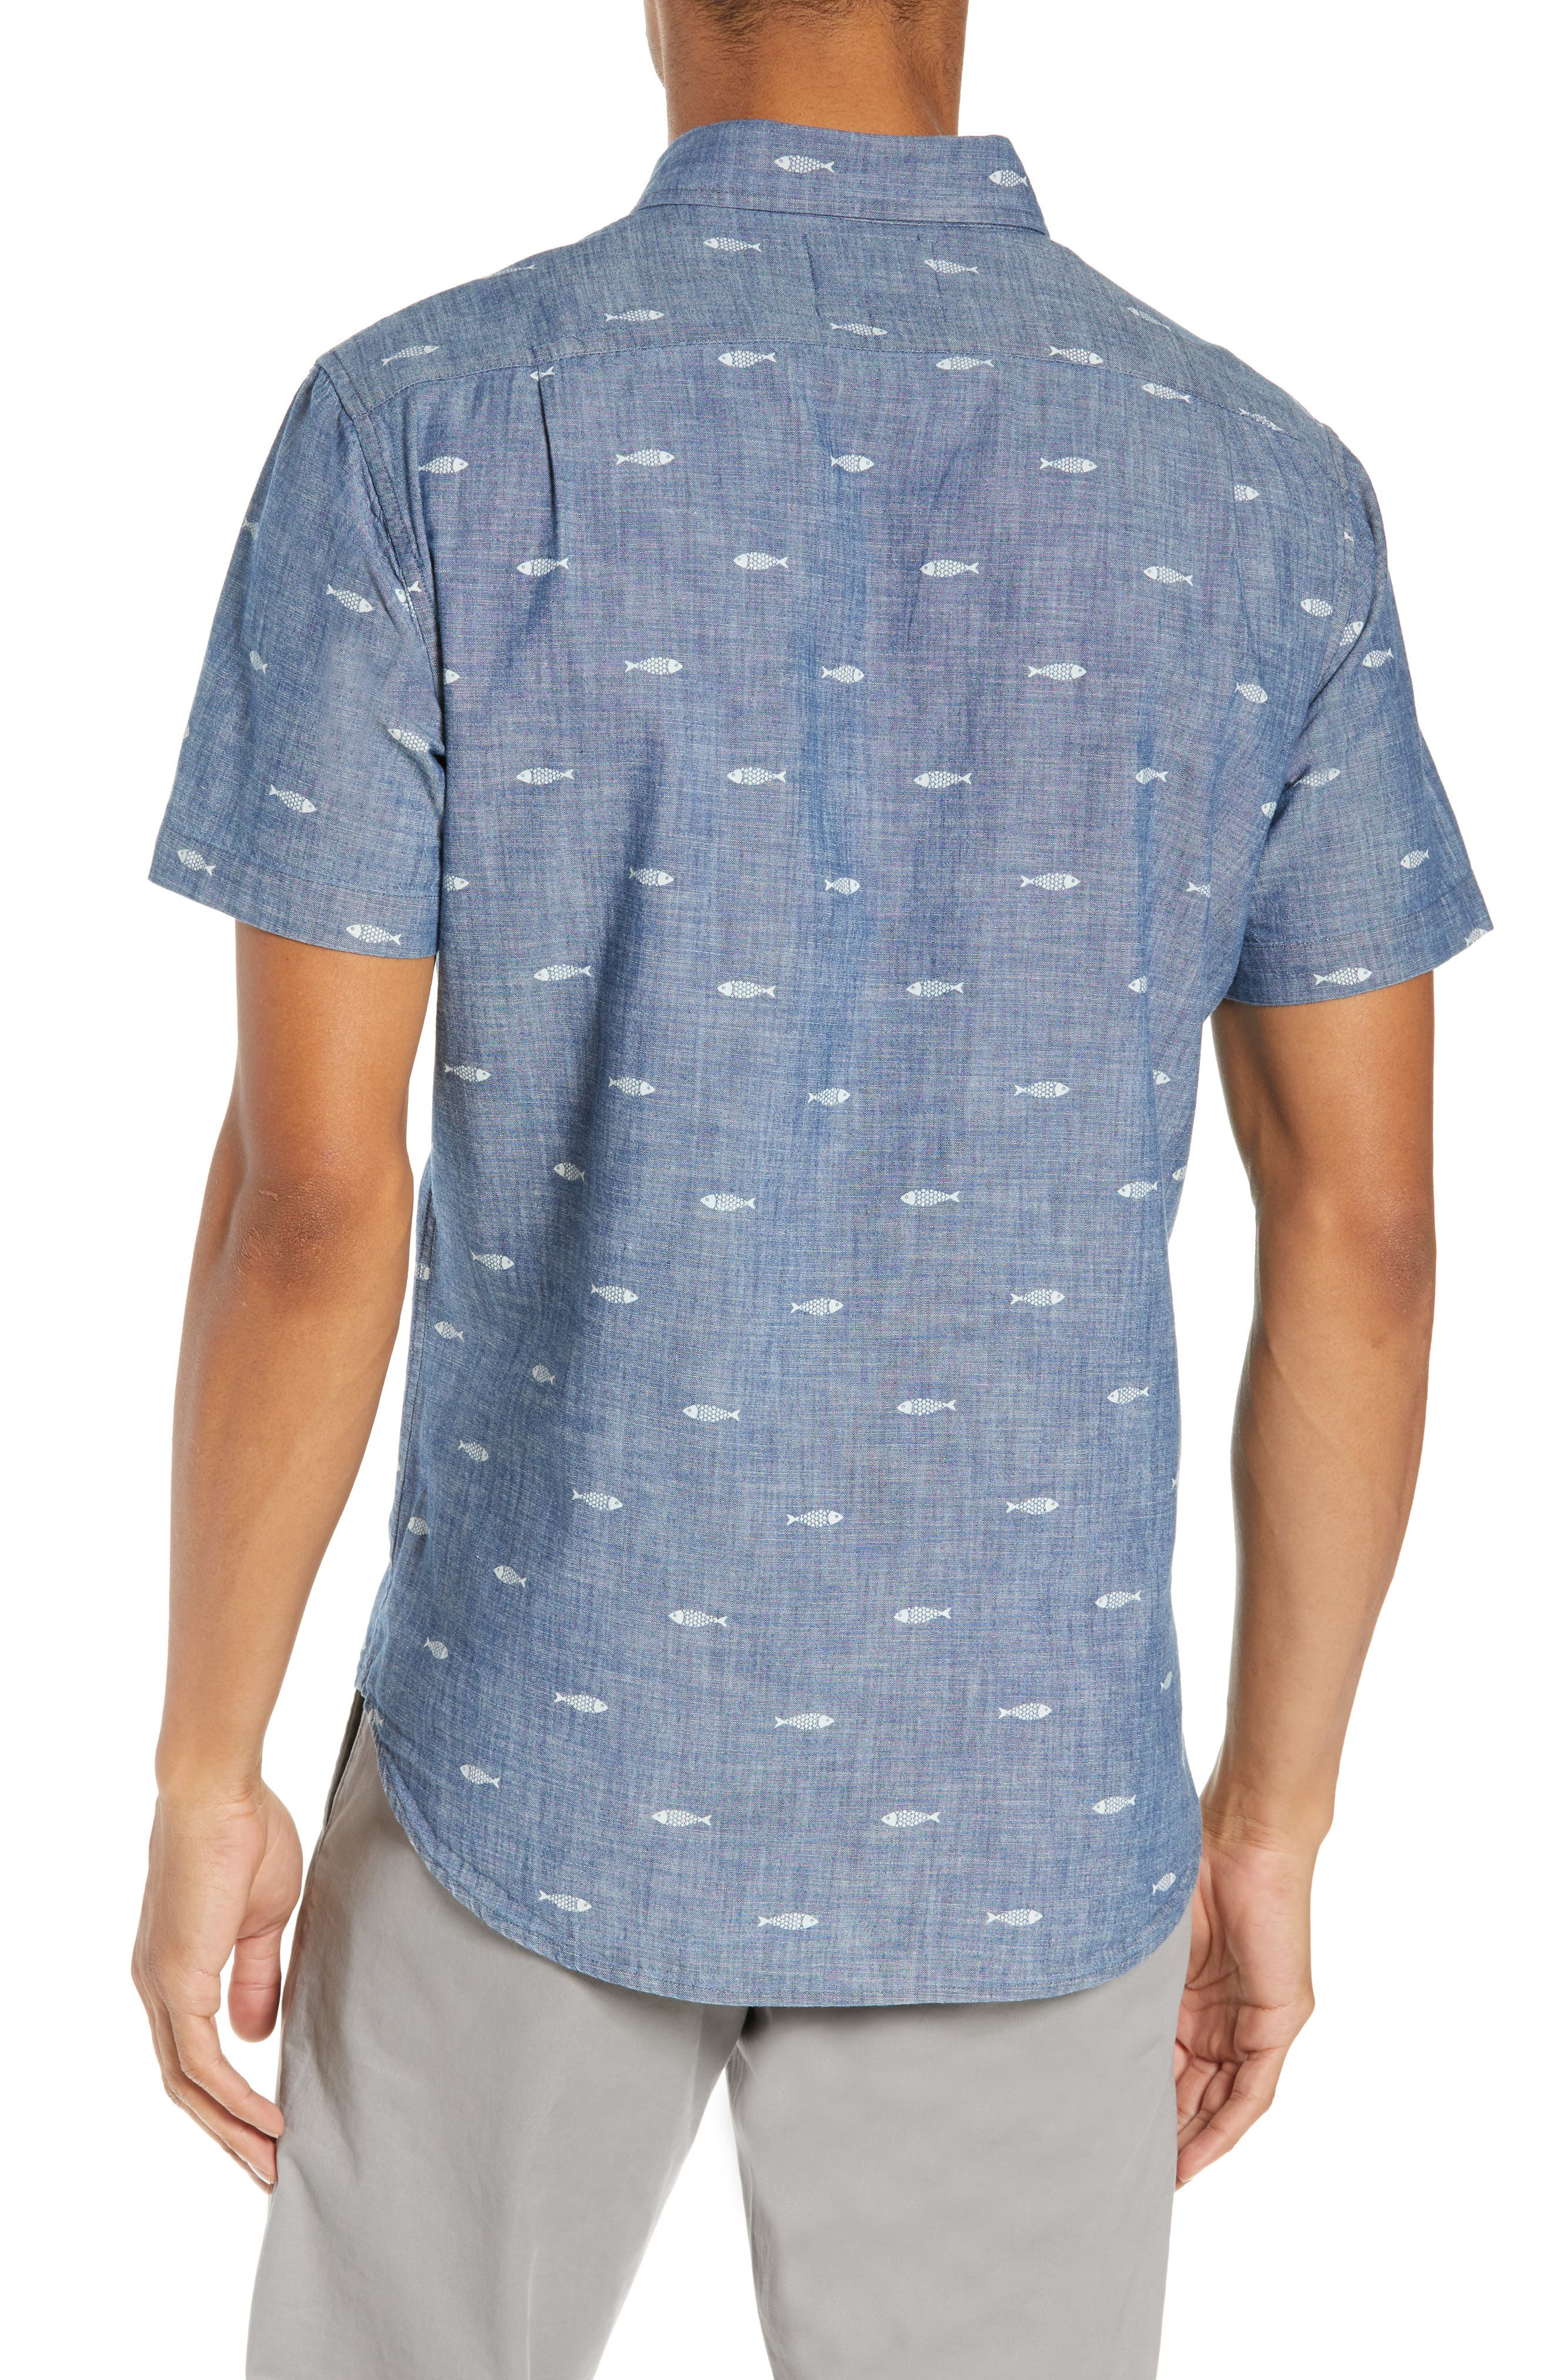 BONOBOS, Riviera Slim Fit Print Sport Shirt, Alternate thumbnail 3, color, CHAMBRAY SARDEEN SCATTER